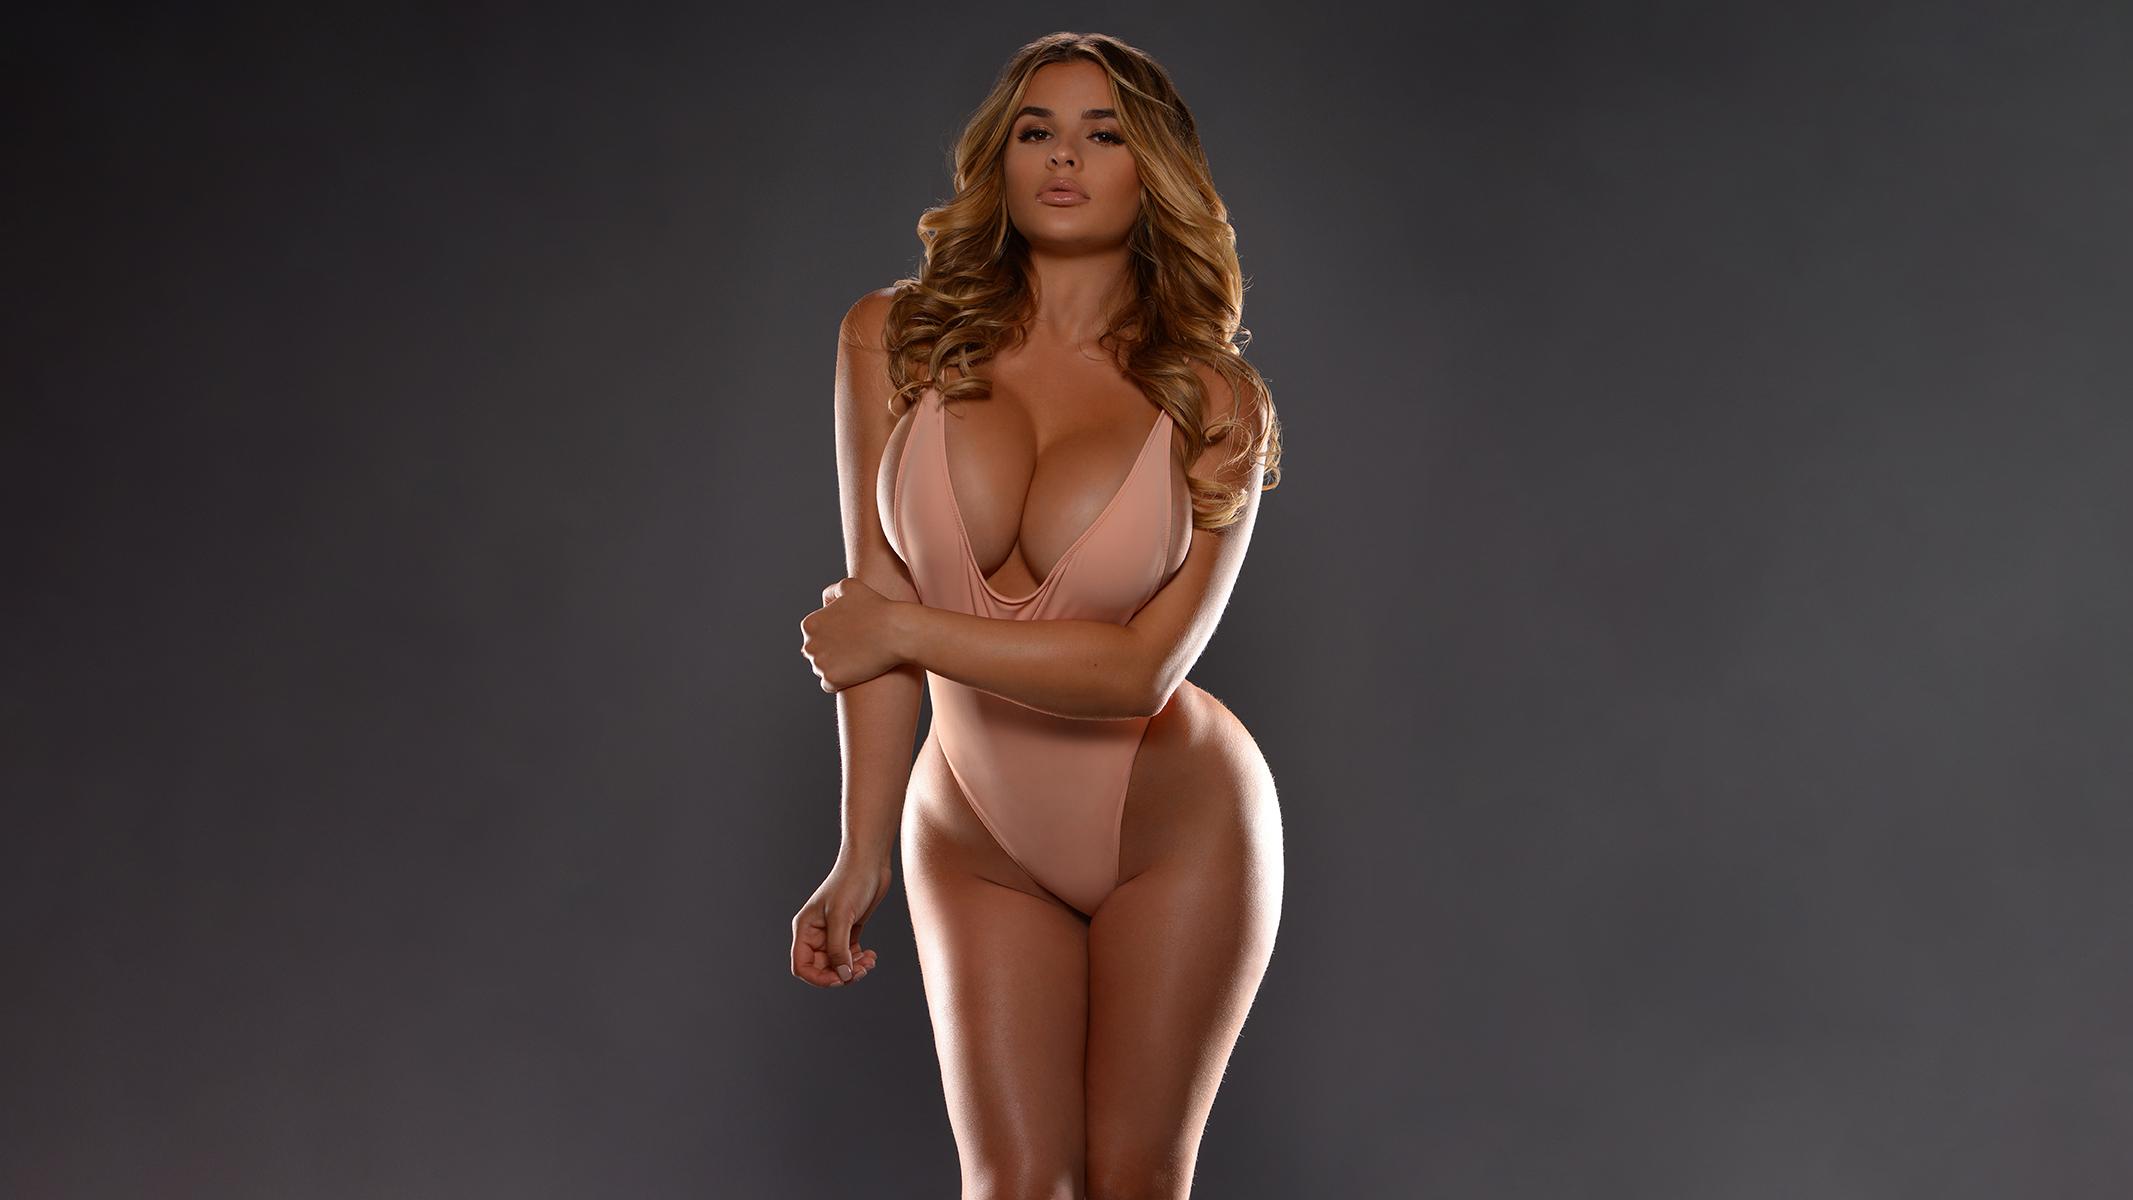 Wallpaper Anastasiya Kvitko Women Model Bodysuit Cleavage